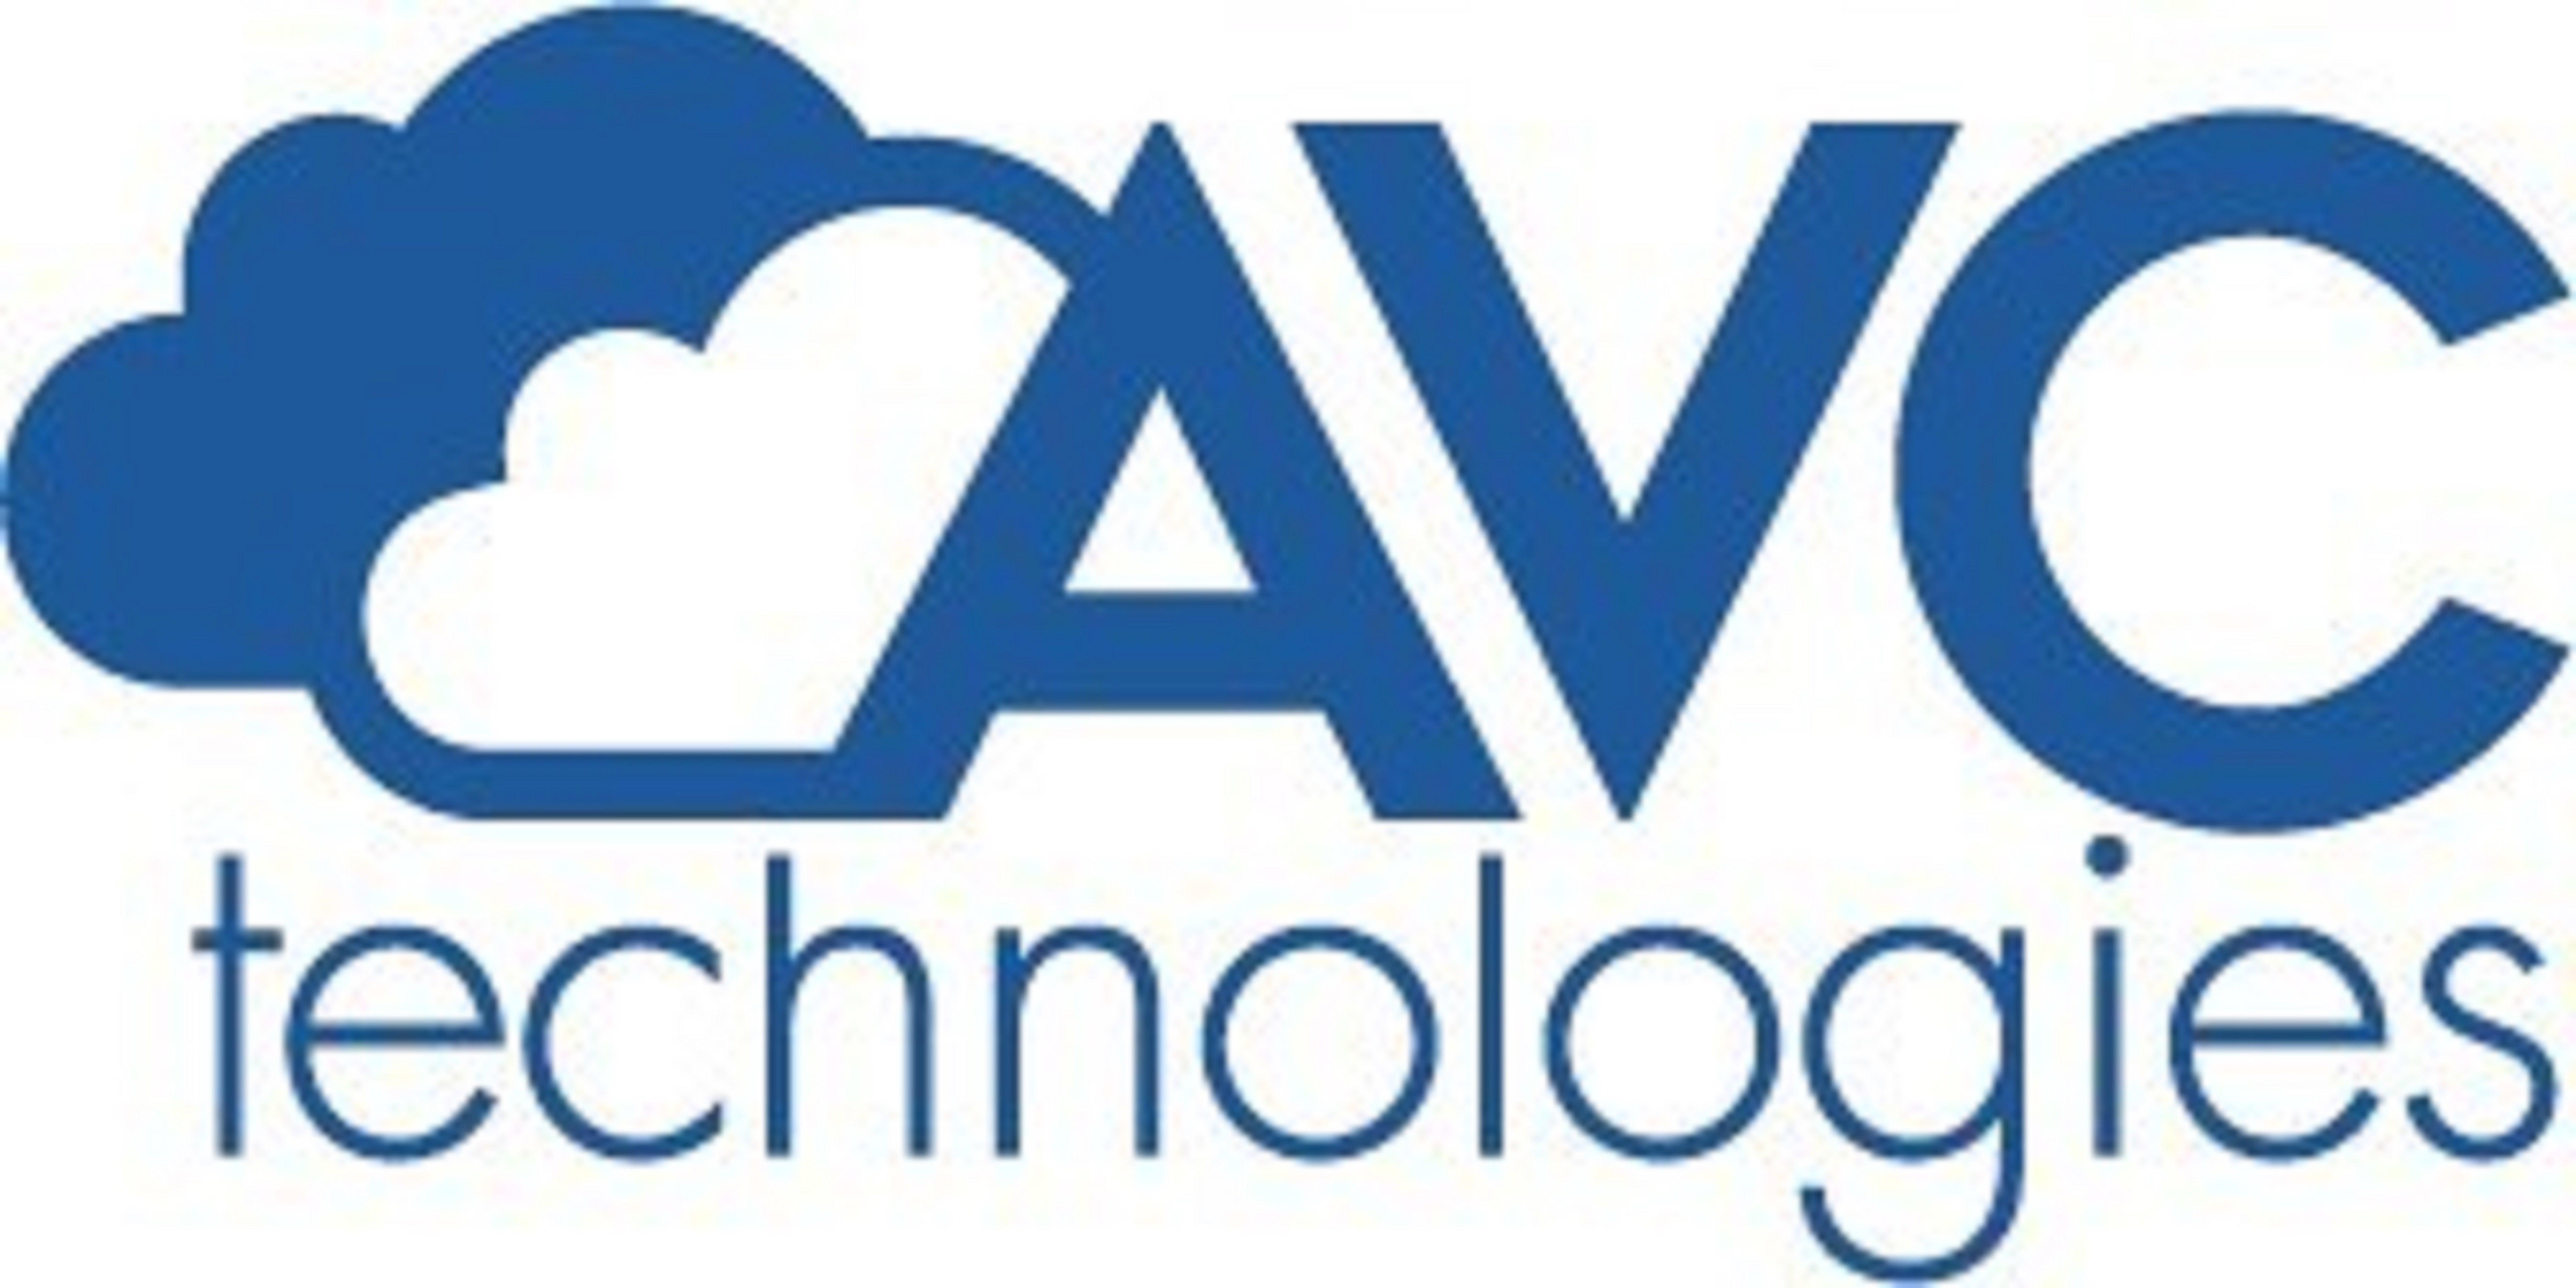 AVCT logo